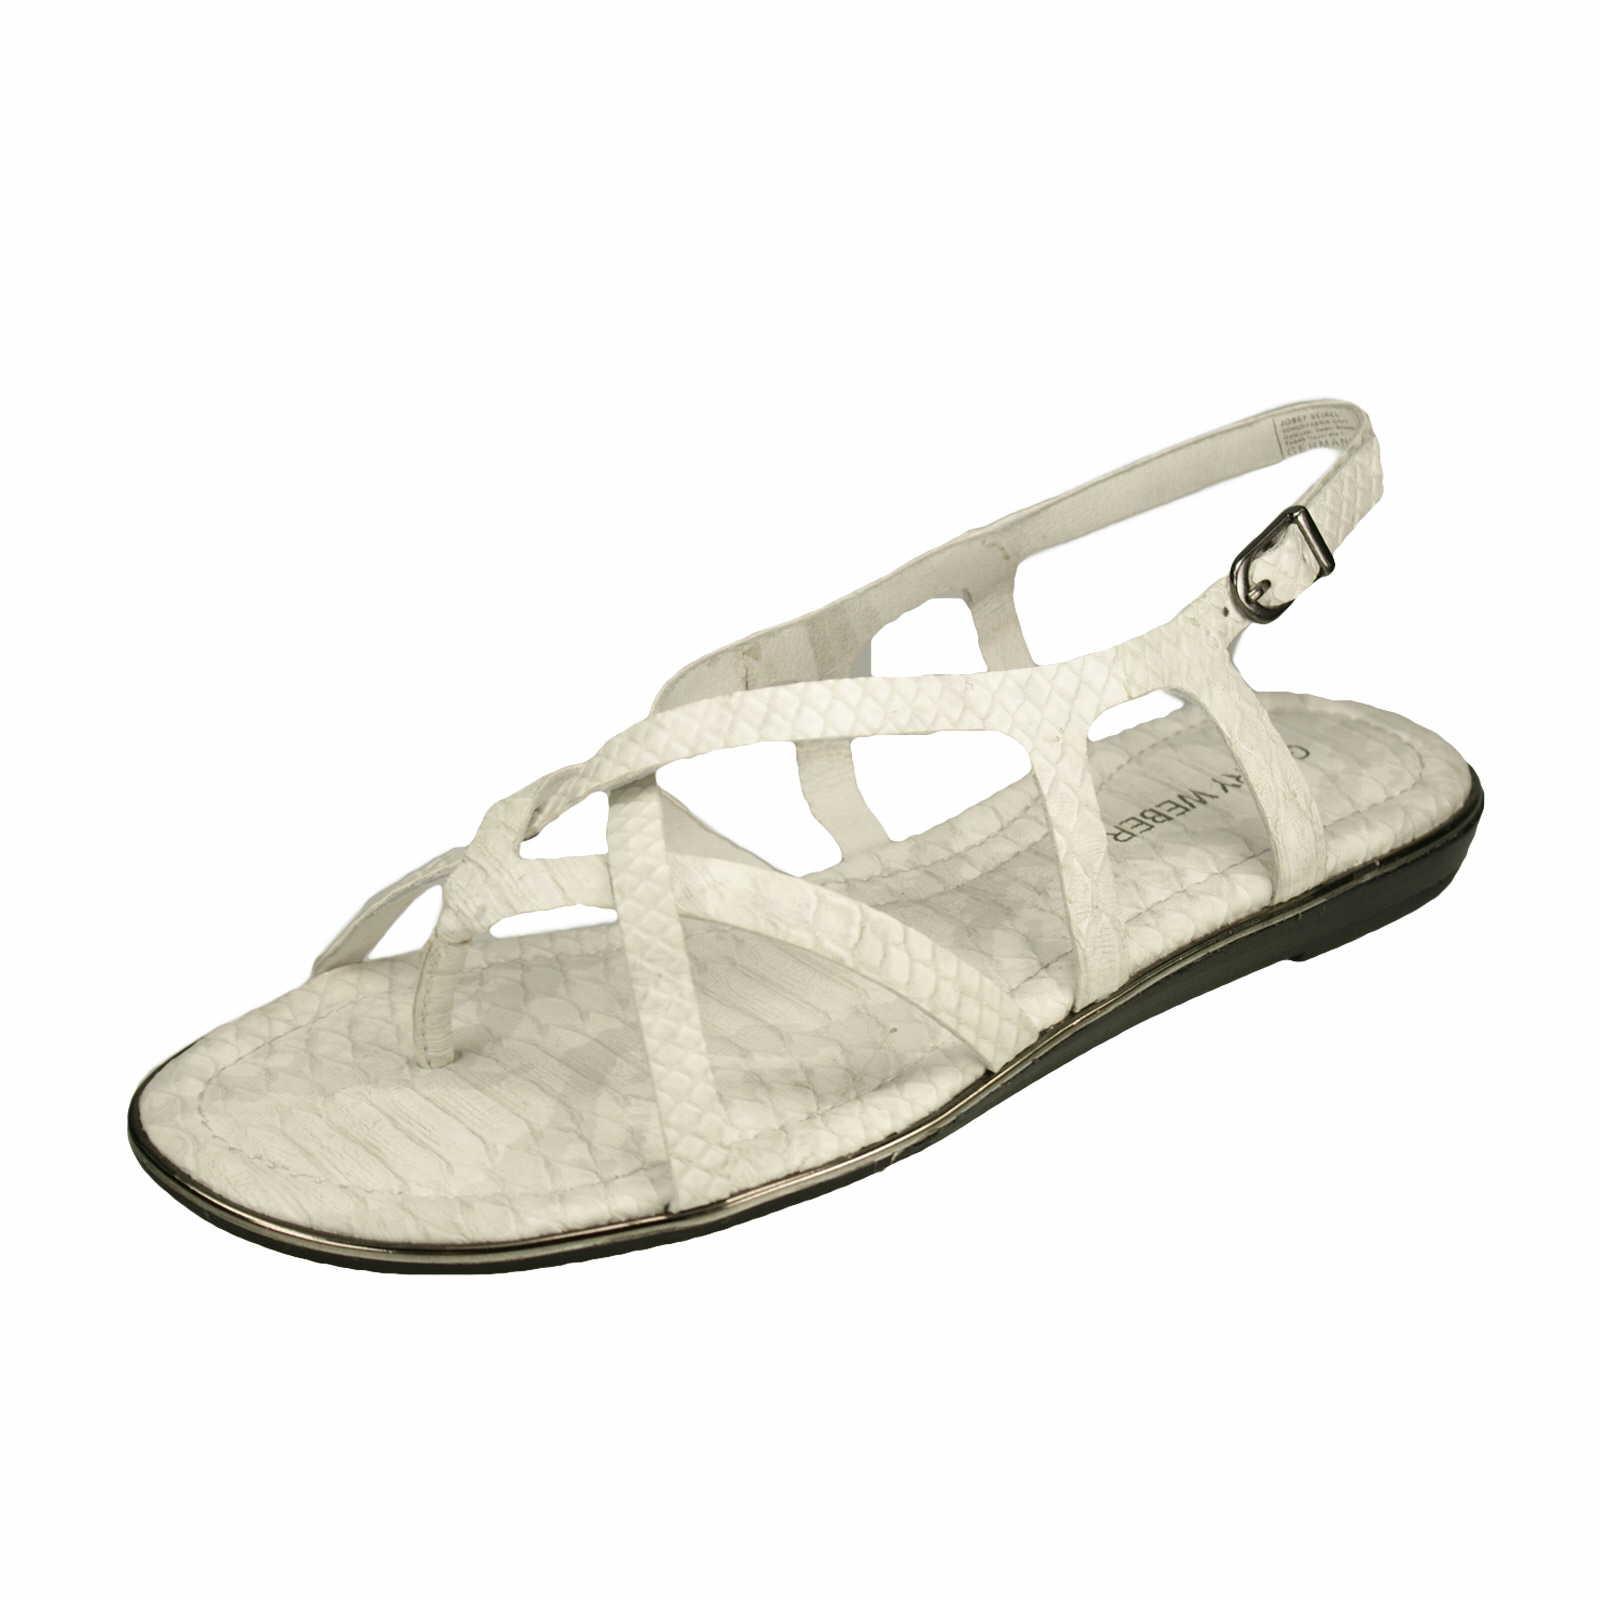 gerry weber shoes weiss jody 01 g31001 830 000 schuhparadies online shop schuhe einfach. Black Bedroom Furniture Sets. Home Design Ideas